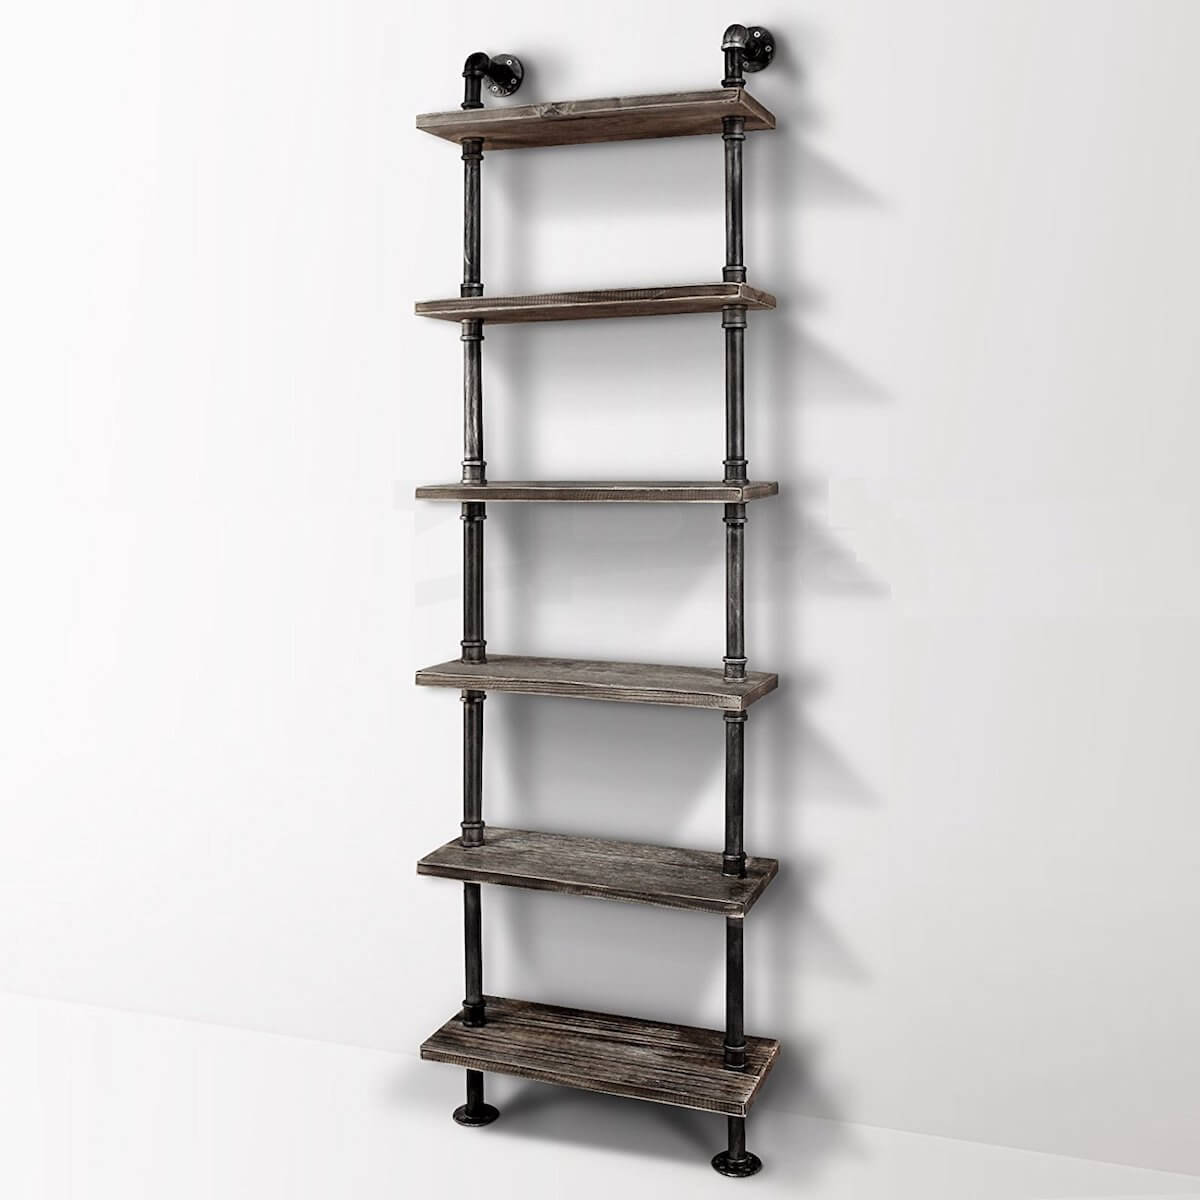 Ladder Style Pipe Shelves